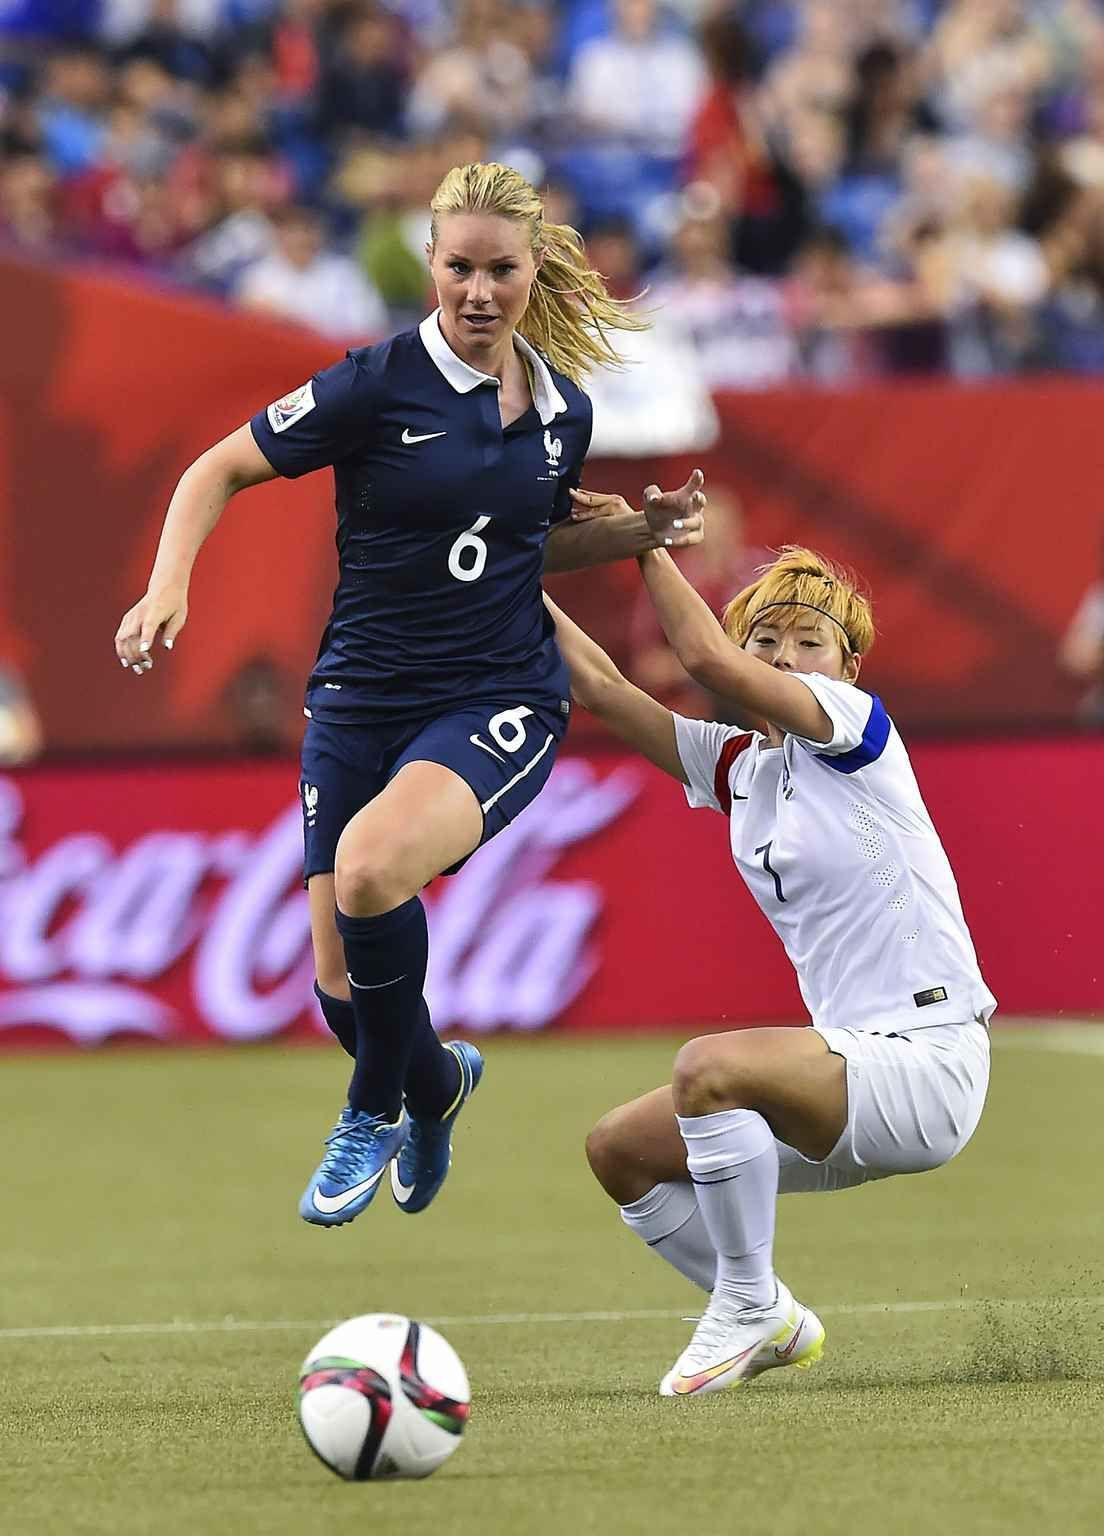 Épinglé par tony sur Ladies Soccer Football féminin